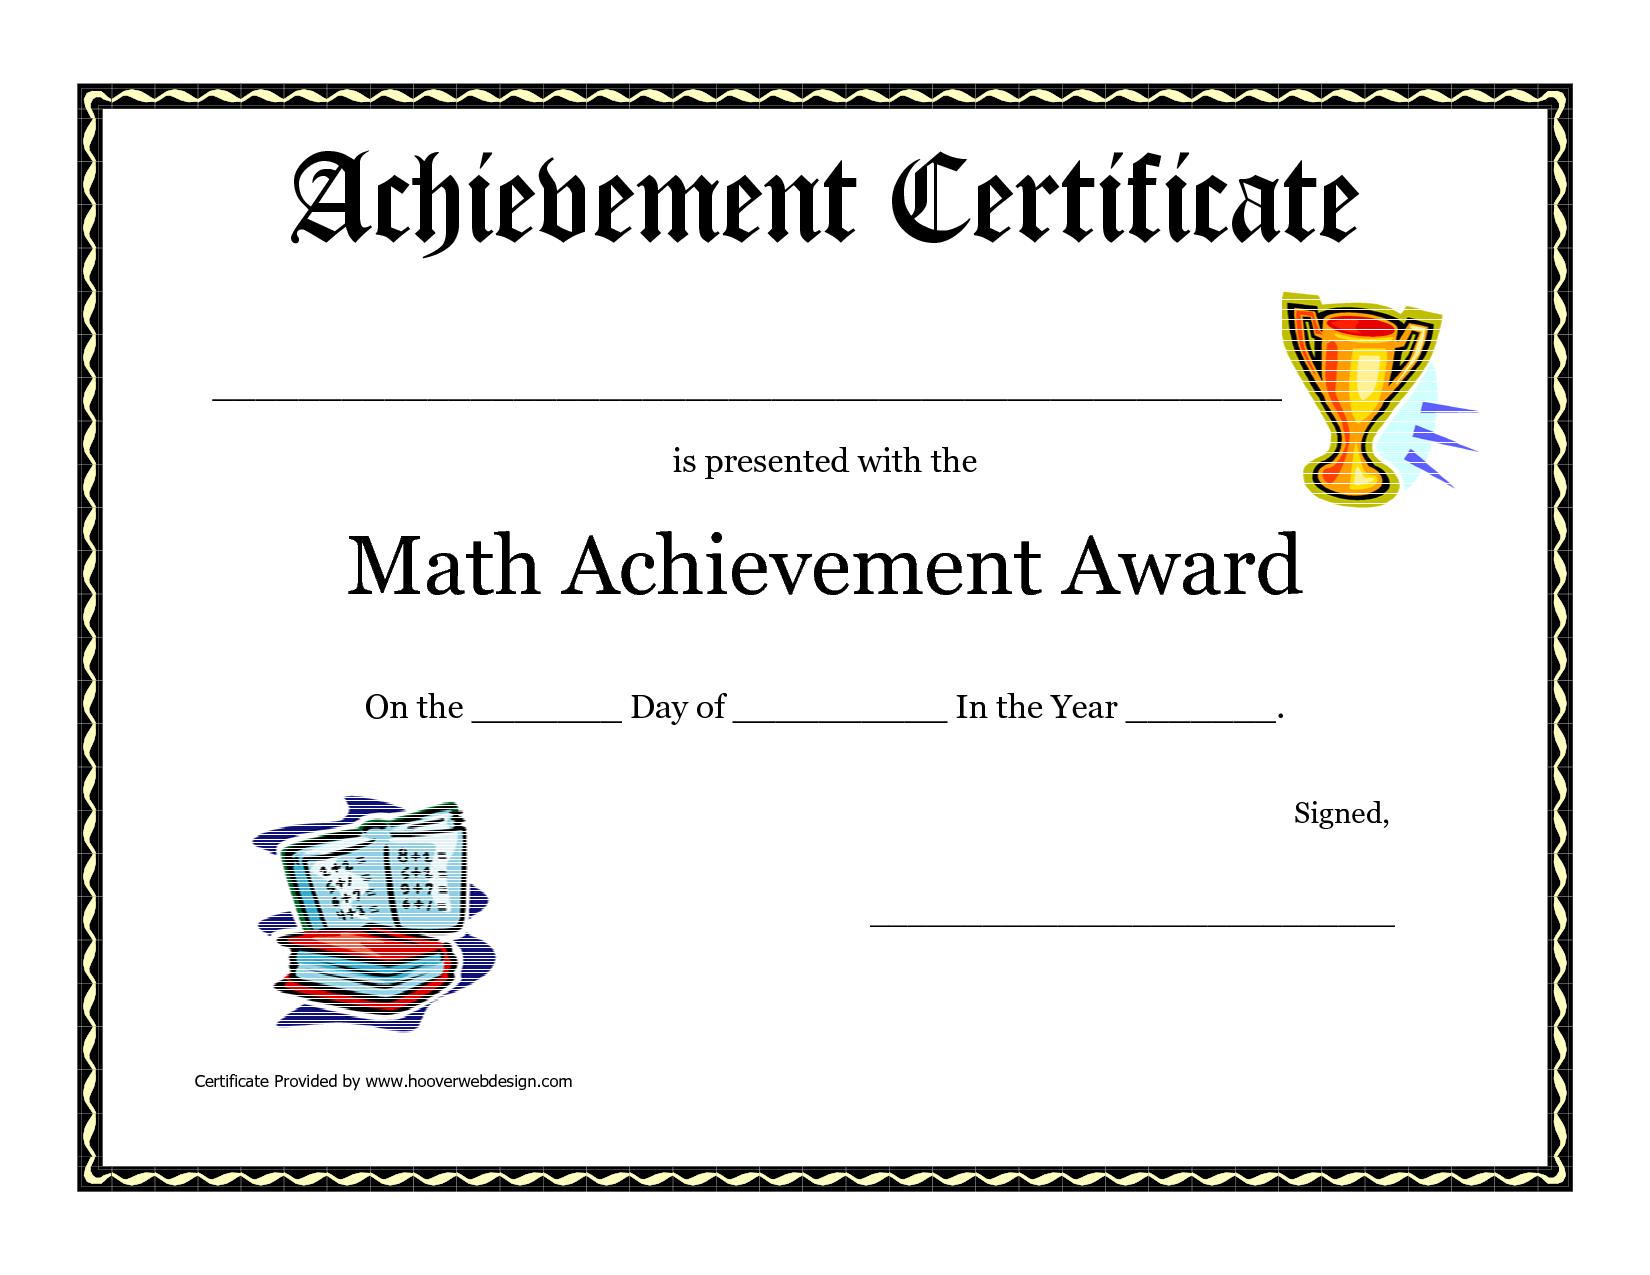 Math Achievement Award Printable Certificate Pdf   Math With Regard To Math Certificate Template